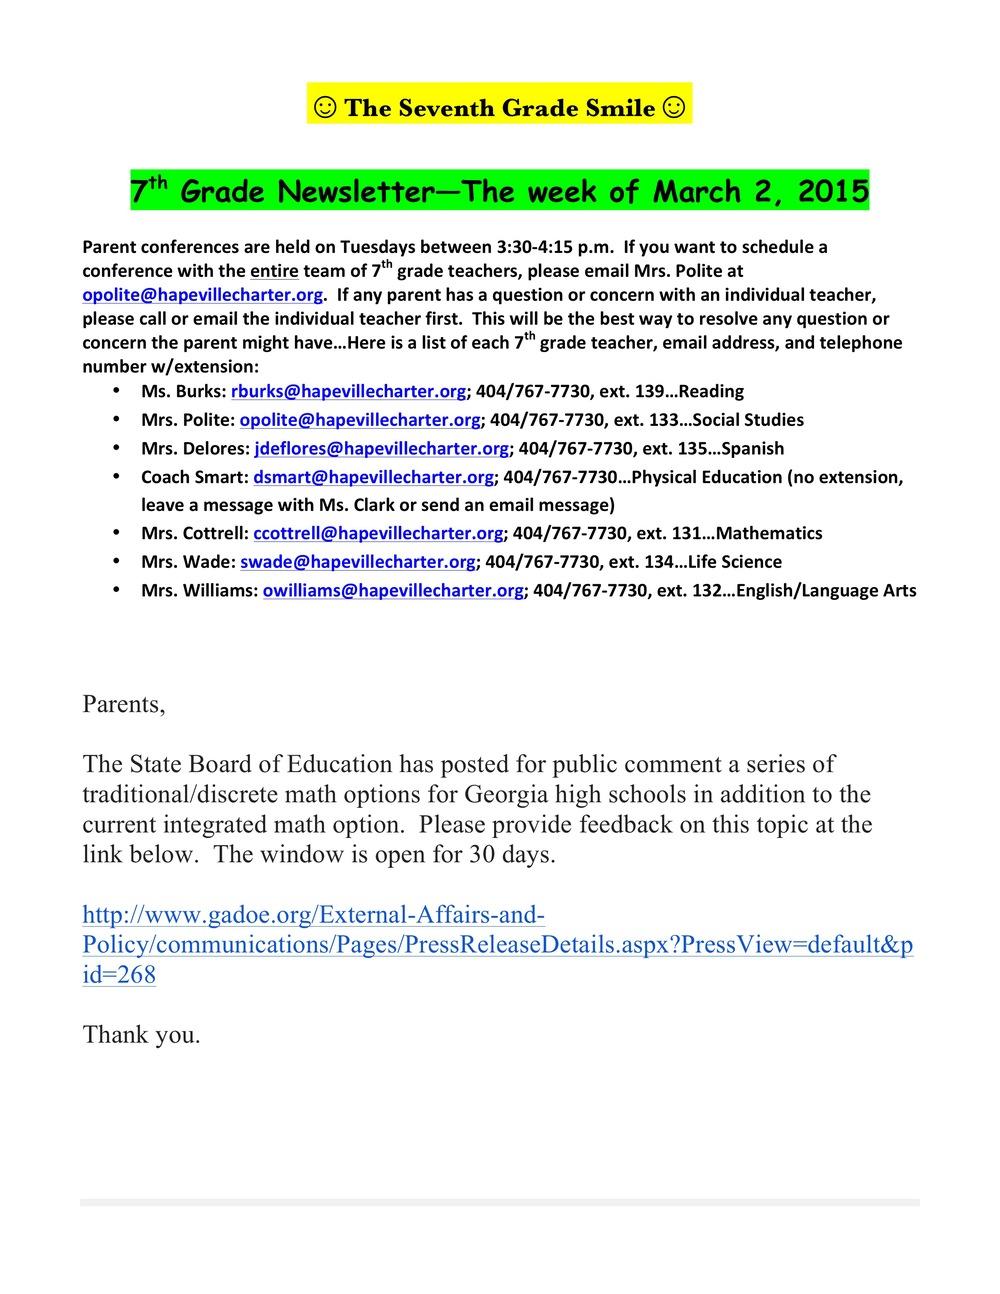 Newsletter Image7th grade 3-2-15.jpeg